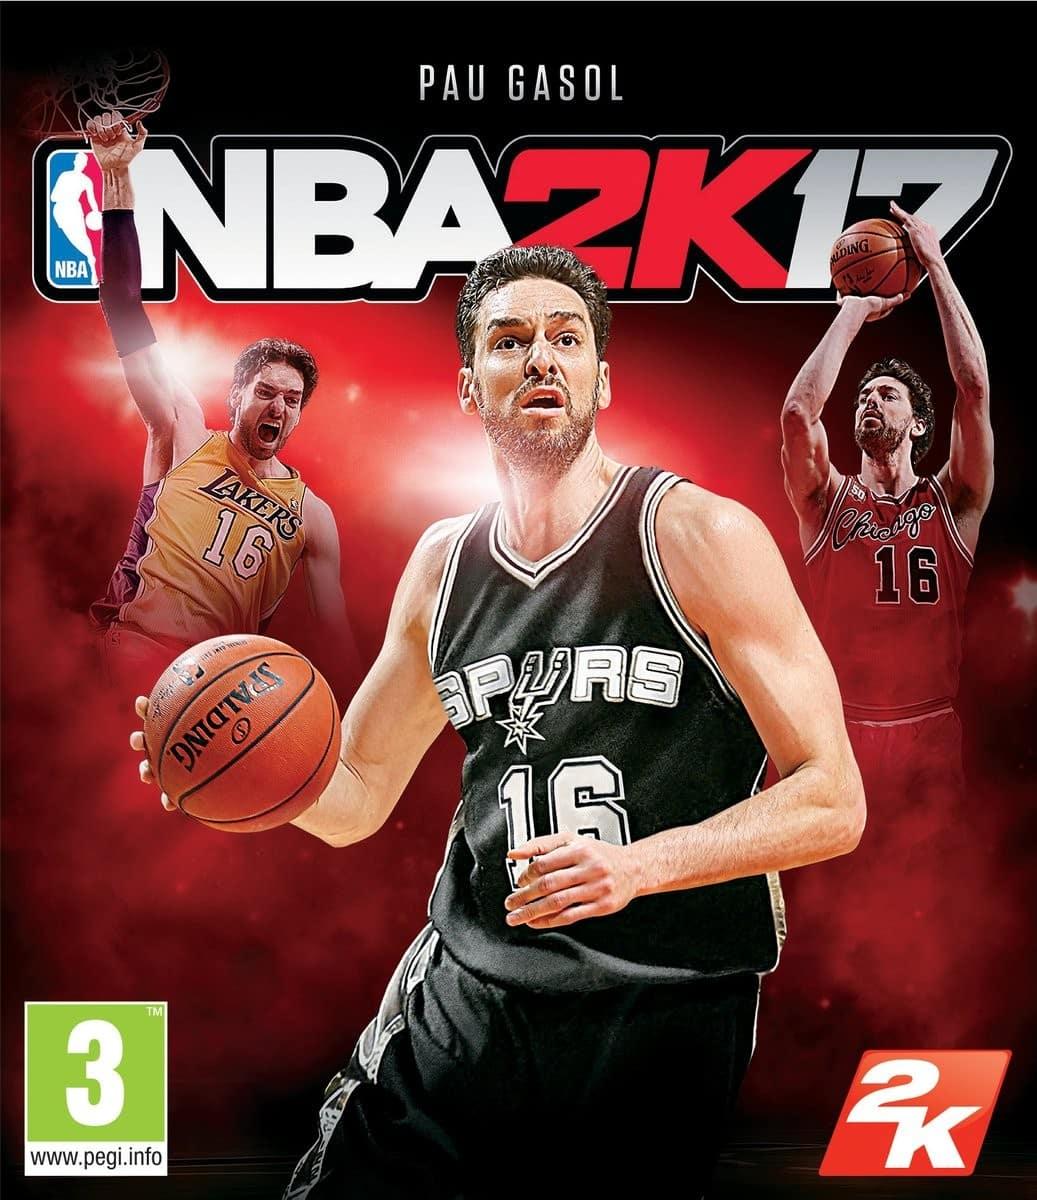 f5a0d359bdd5 Pau Gasol Is The NBA 2K17 Spanish Cover Star - Sports Gamers Online